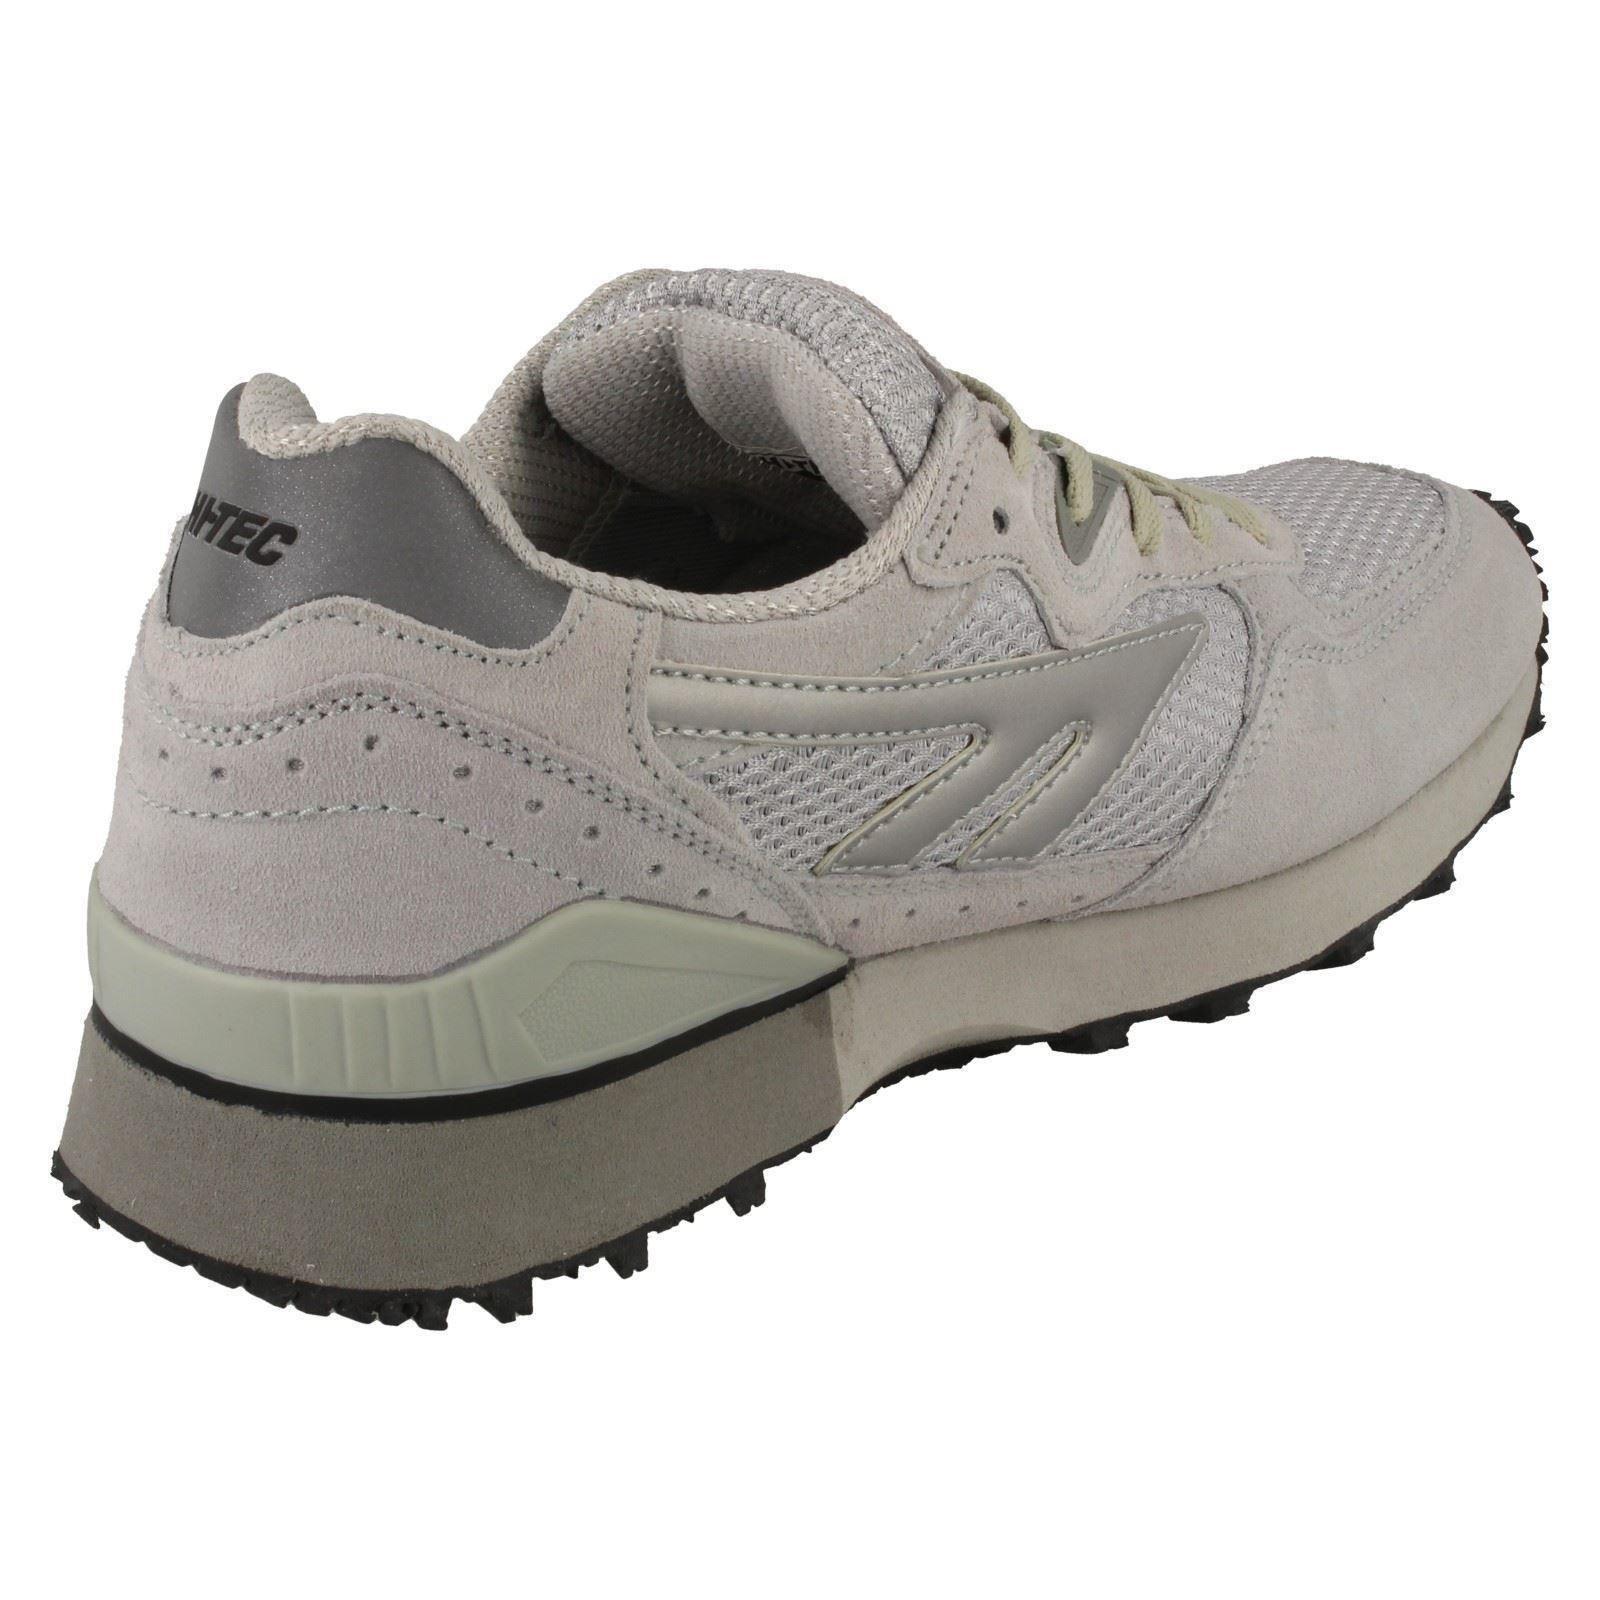 Zapatillas para hombre Informal Hi-Tec sombra de Plata II